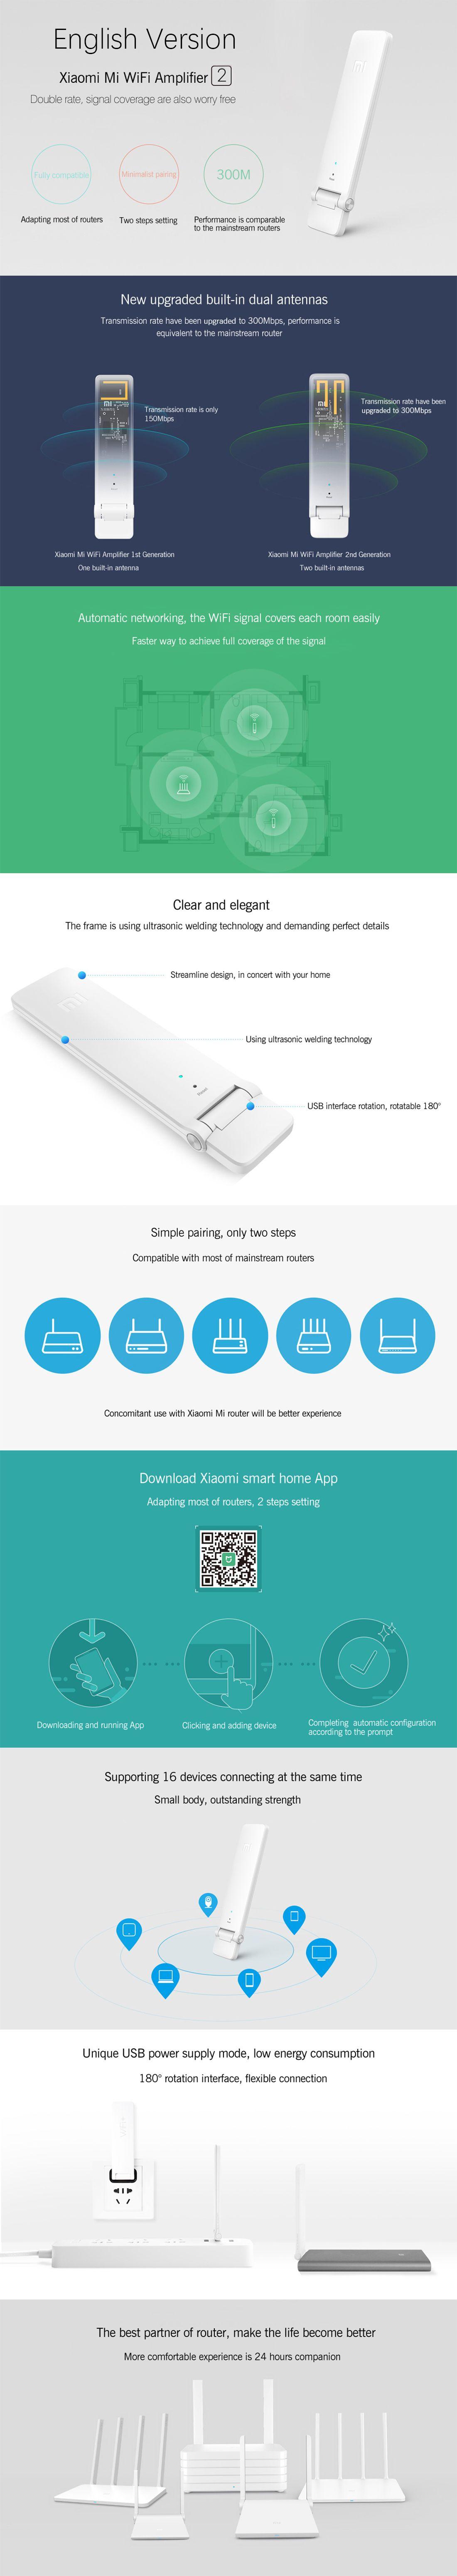 Xiaomi Mi 300Mbps WiFi Repeater 2 - English Version | Wifi